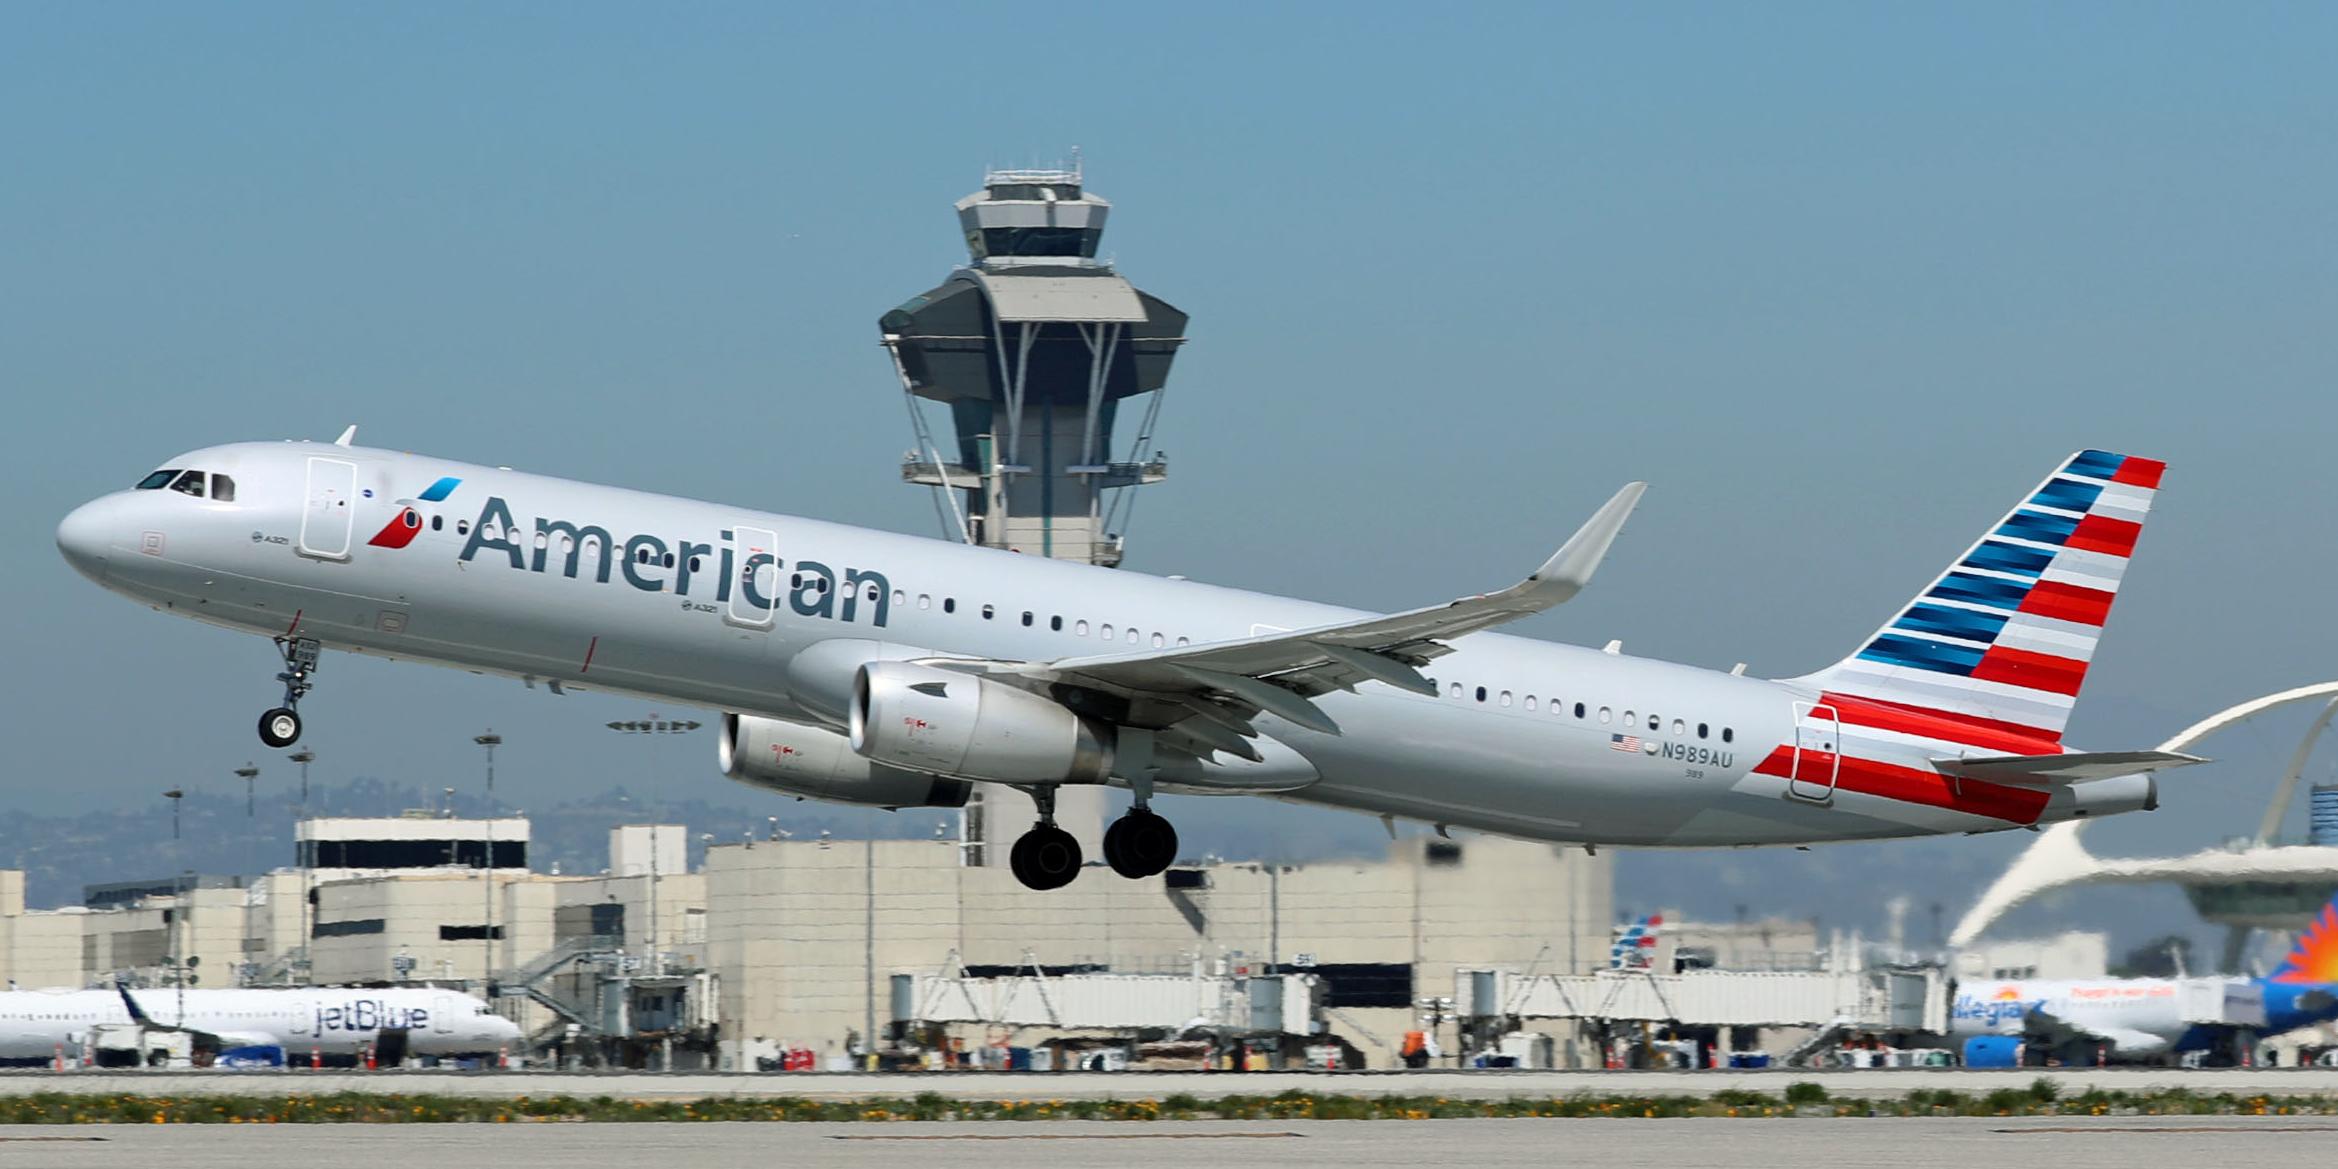 American Airlines планує залучити $ 3,5 млрд